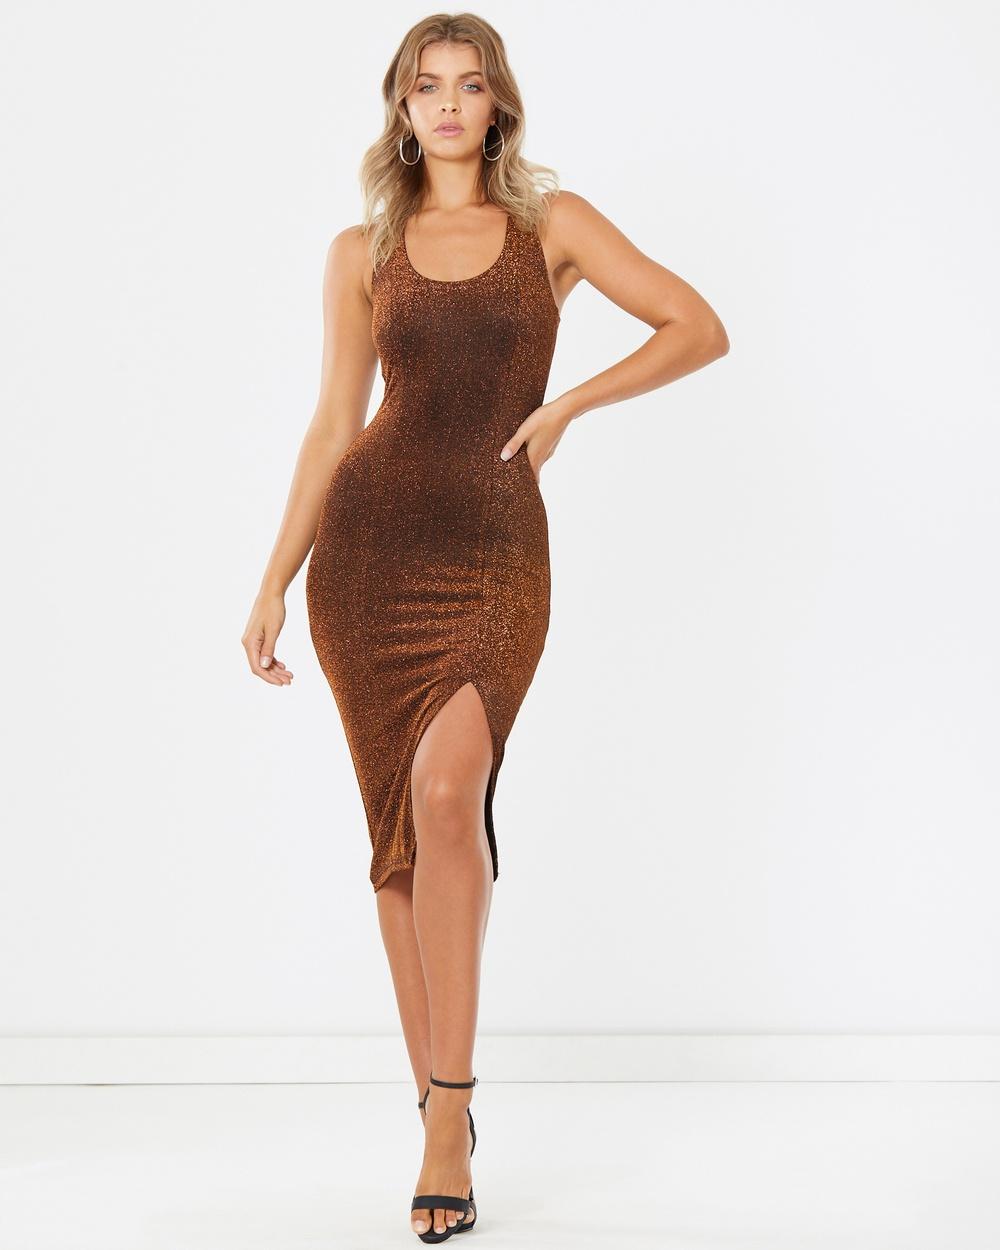 Calli Valena Dress Dresses Gold Valena Dress